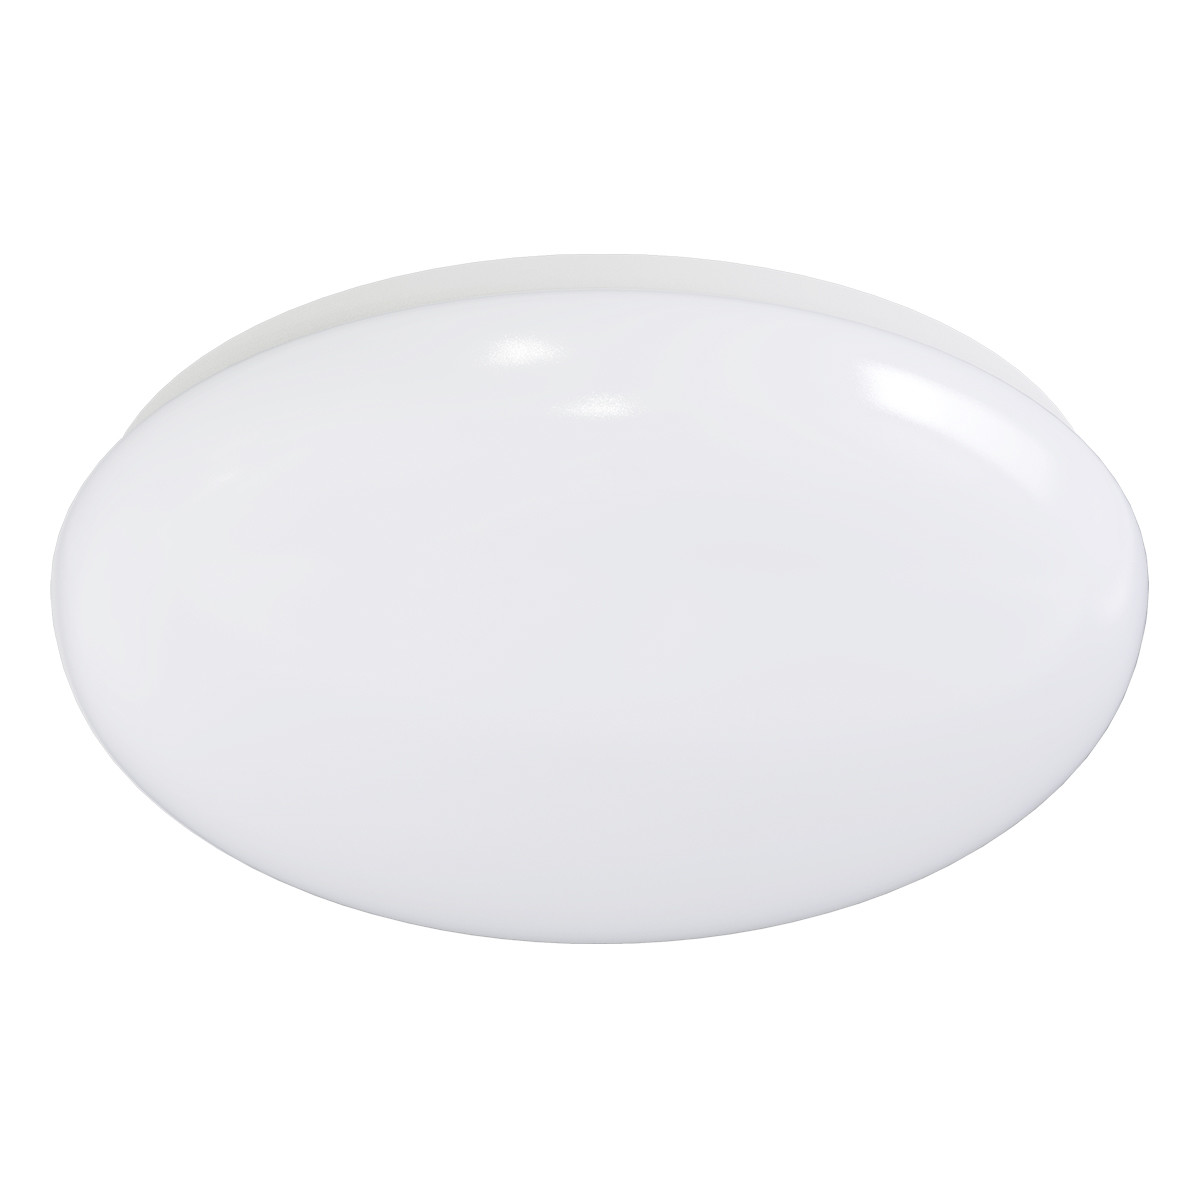 LED Plafondlamp met Bewegingssensor - Aigi - Opbouw Rond 18W - Warm Wit 3000K - 360° - Mat Wit Alumi